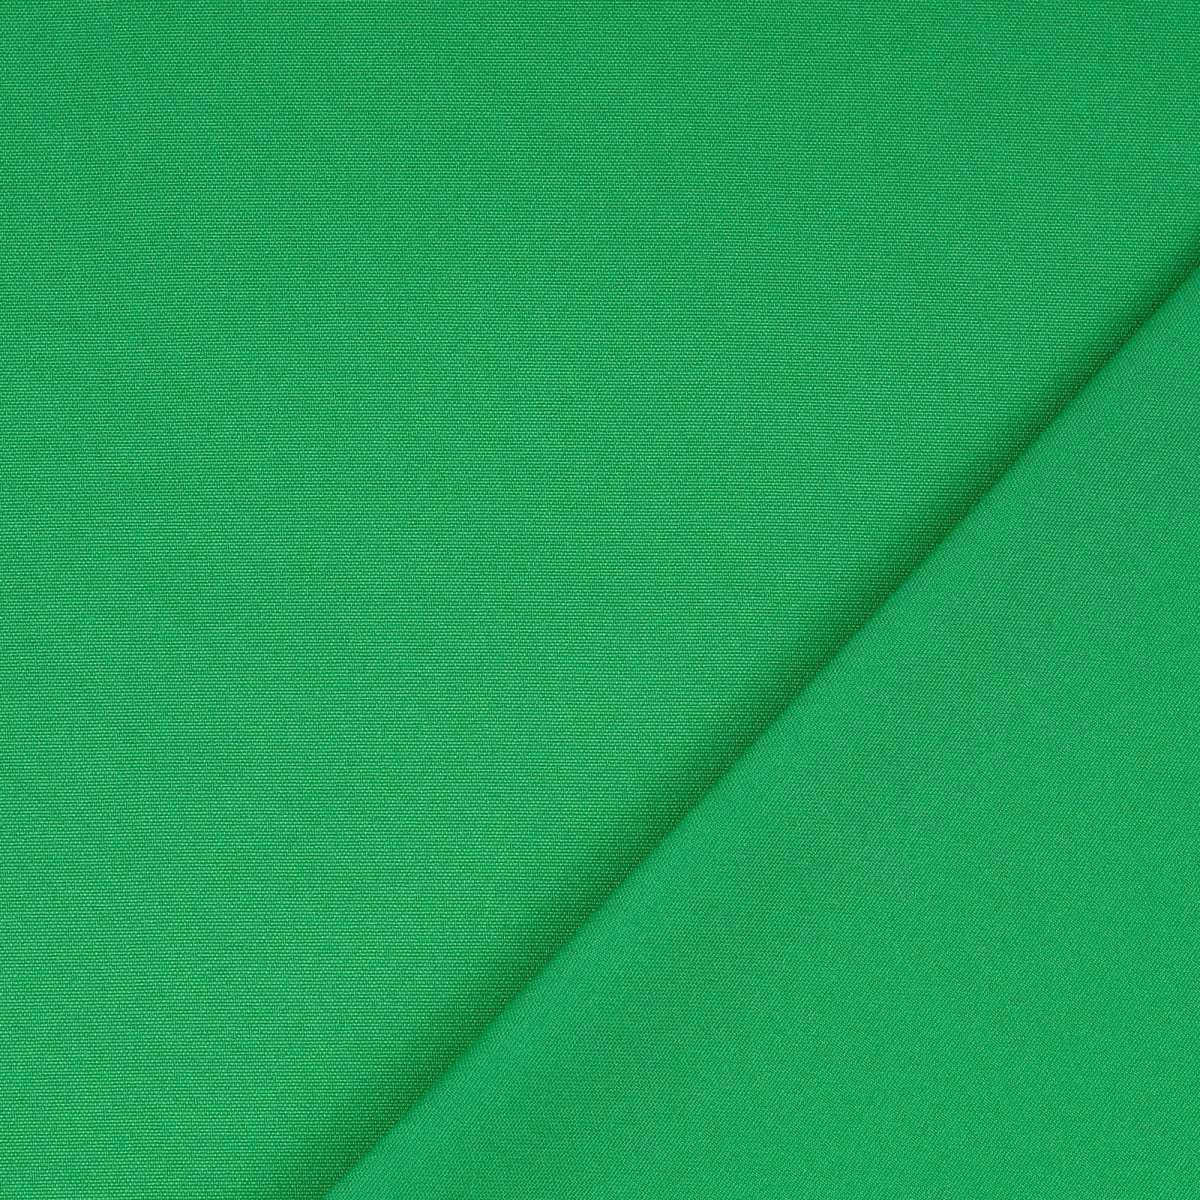 Baumwolljersey uni Meterware grasgrün 5035